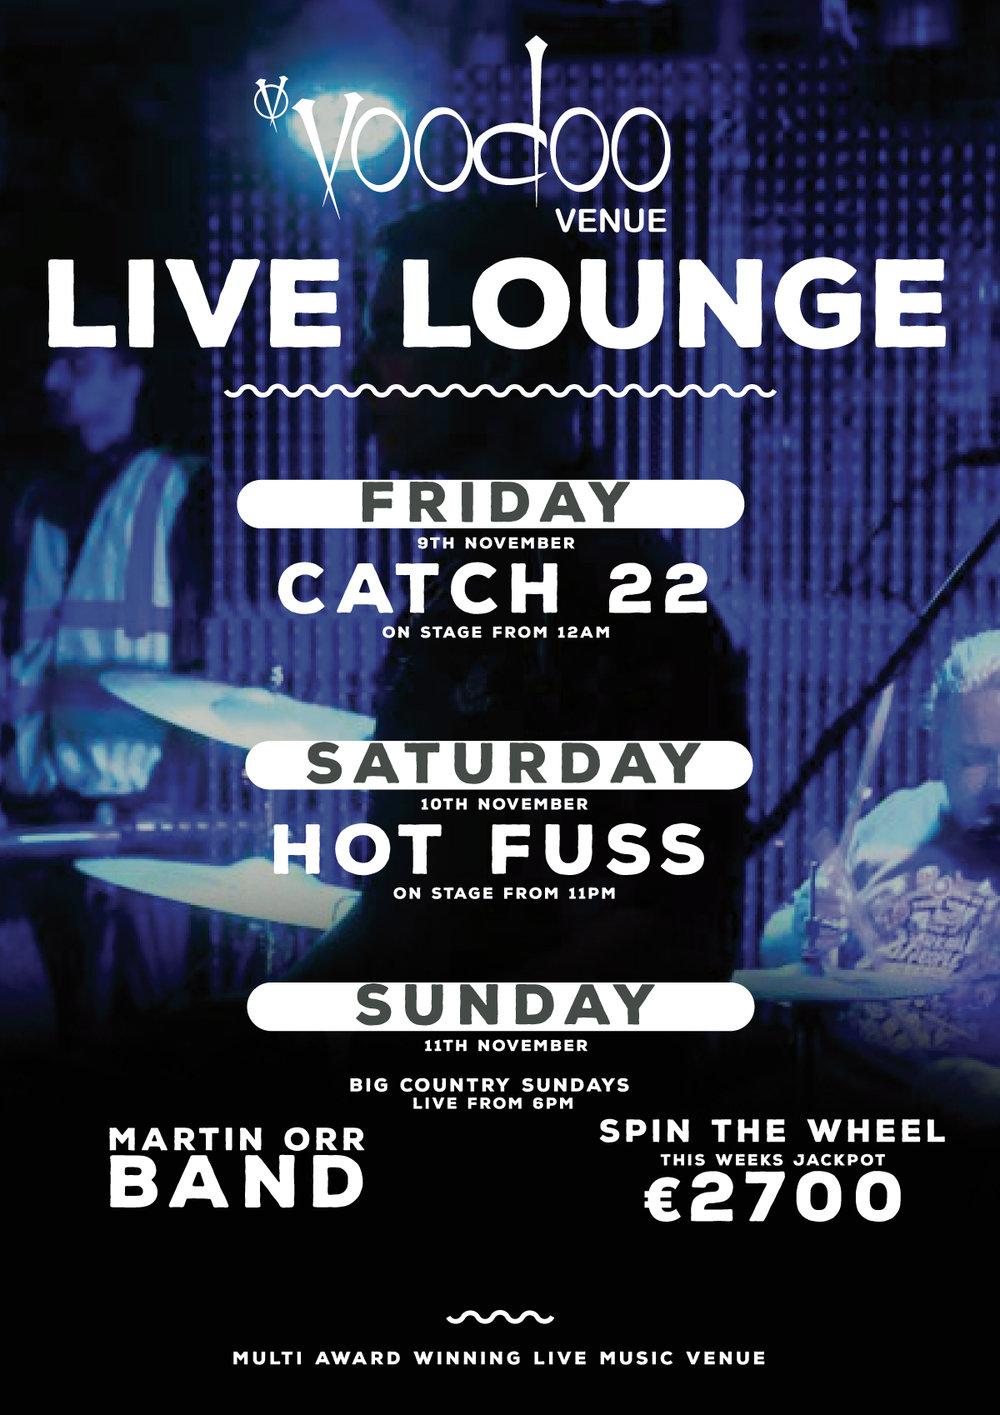 voodoo-venue---live-lounge---fri-nov-9---sun-12-2018.jpg